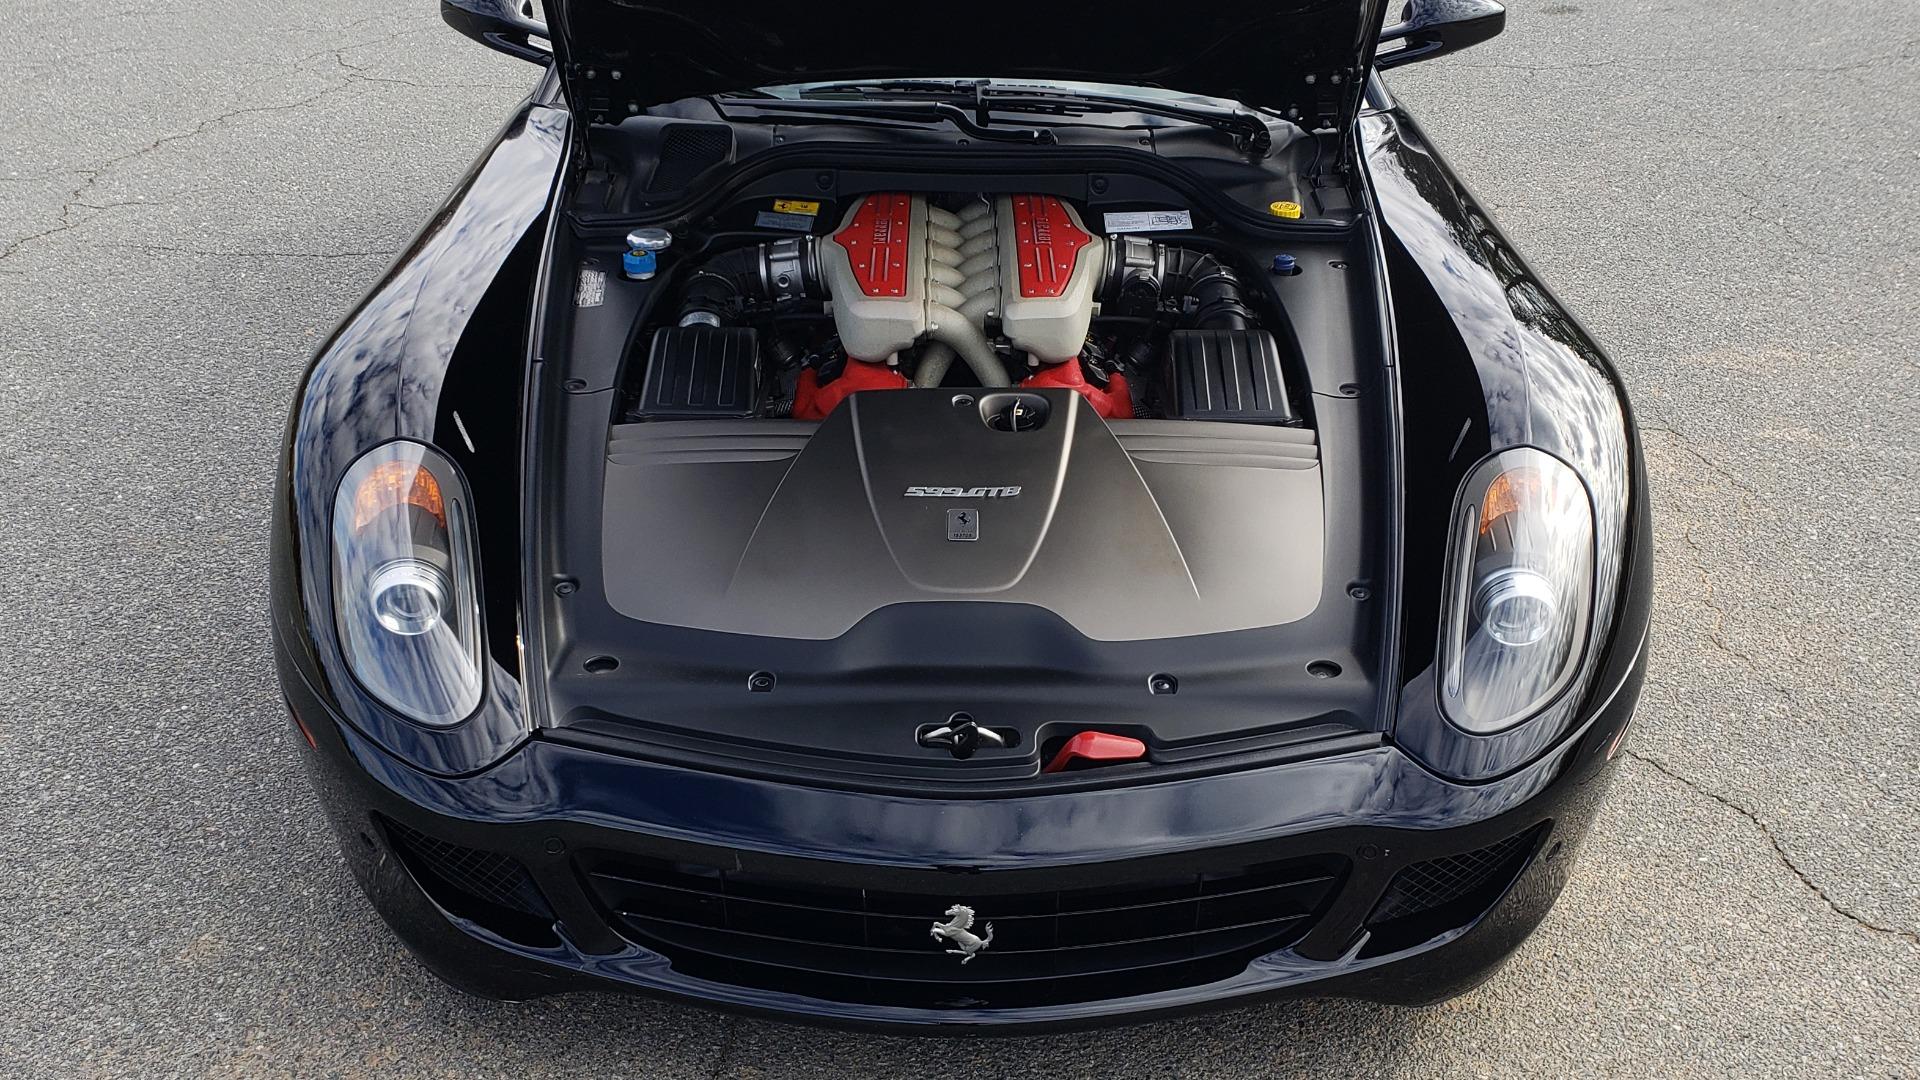 Used 2007 Ferrari 599 GTB FIORANO HGTE / V12 / F1 TRANS / NAV / BOSE / CUSTOM WHEELS for sale $109,999 at Formula Imports in Charlotte NC 28227 56